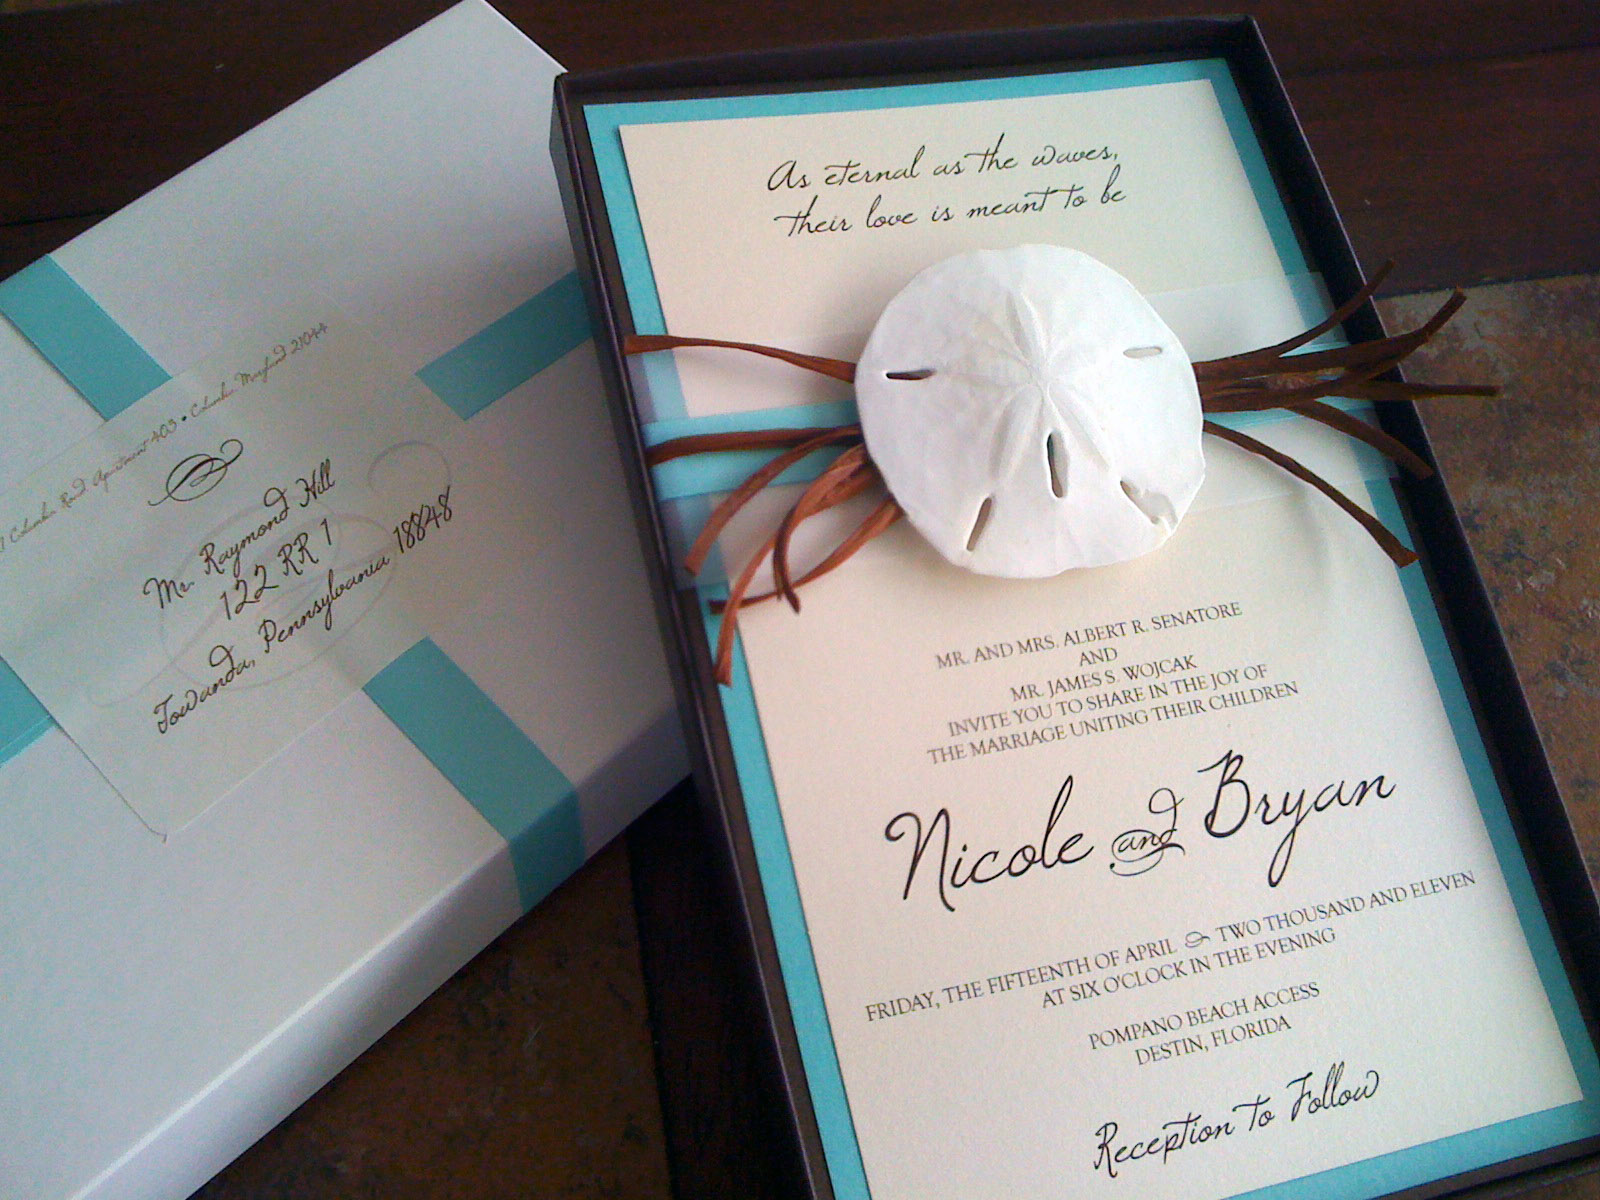 Wedding Invitation In A Box: Kindly R.S.V.P. Designs' Blog: Wedding Invitations